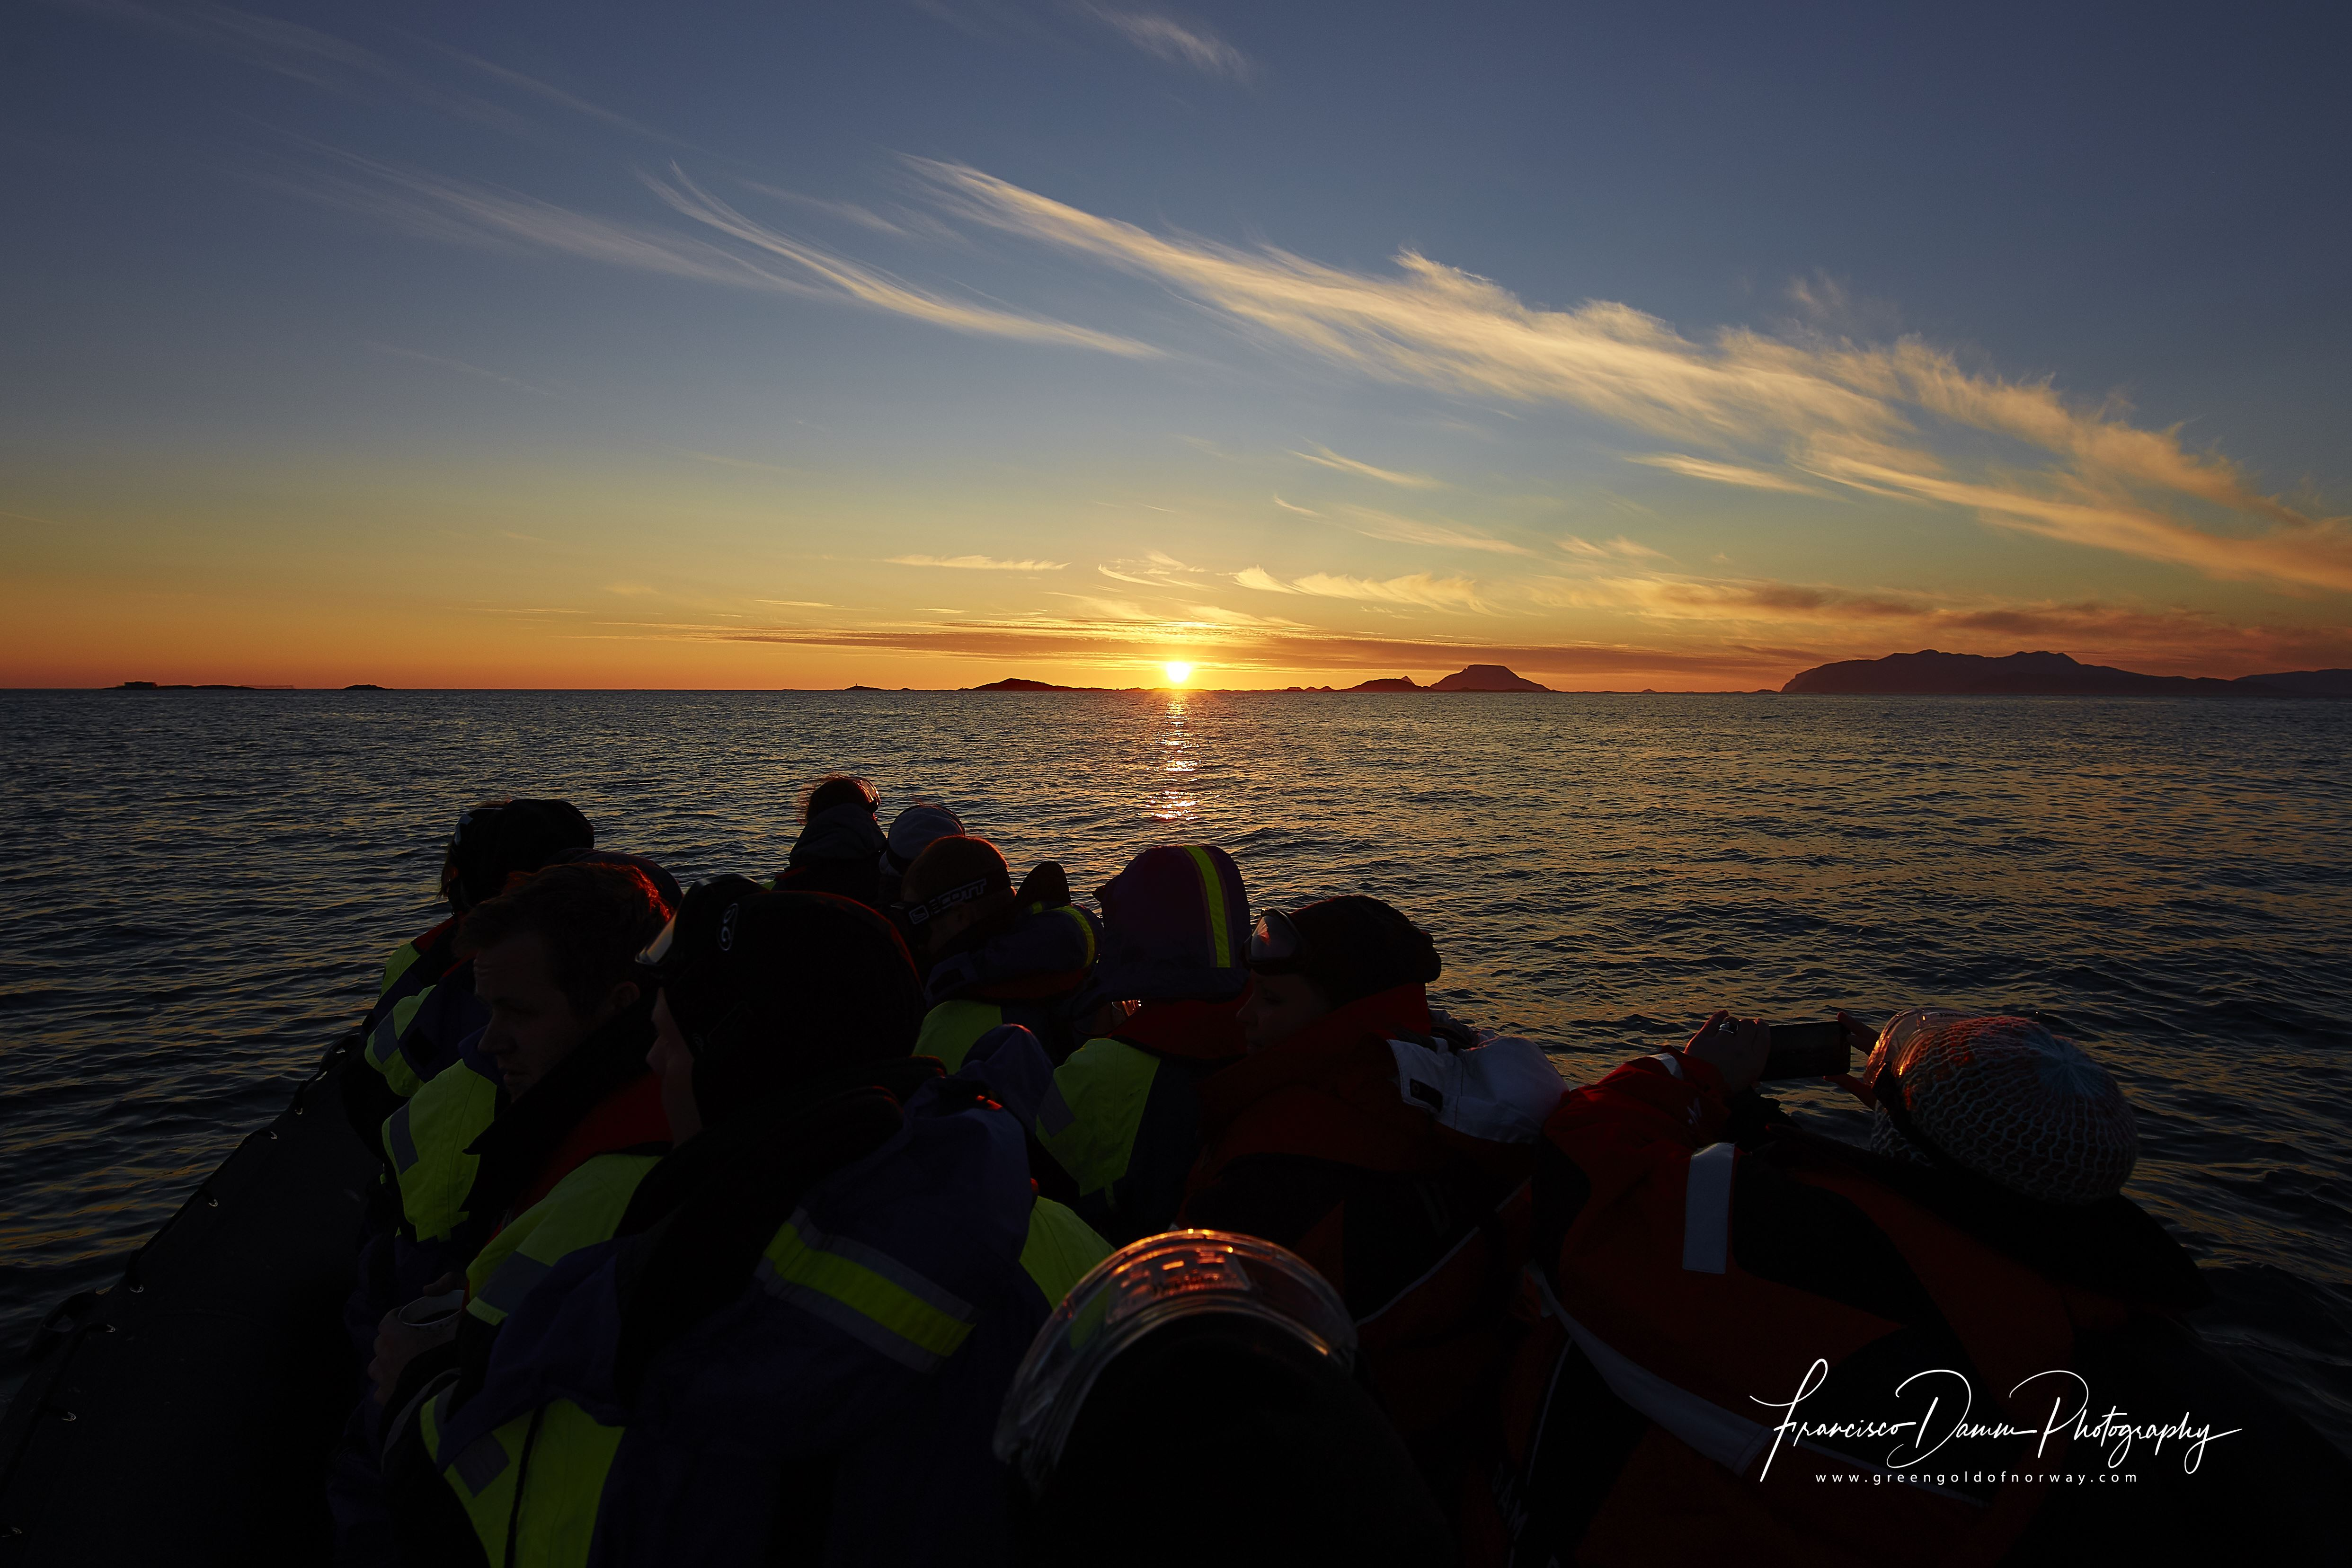 Midnight Sun photo safari by RIB Boat - Green Gold of Norway